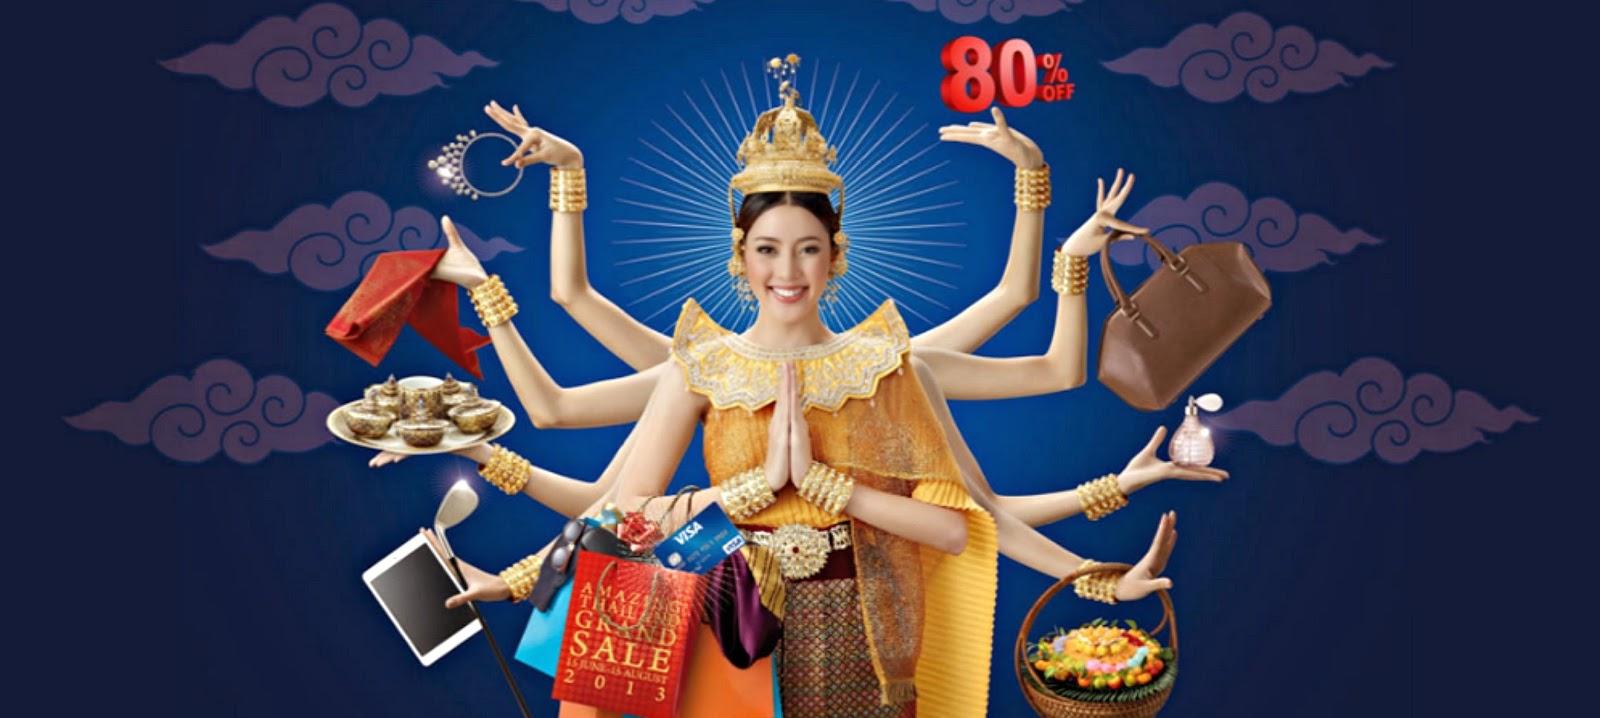 http://sapphirepalace.nhavuong.vn/